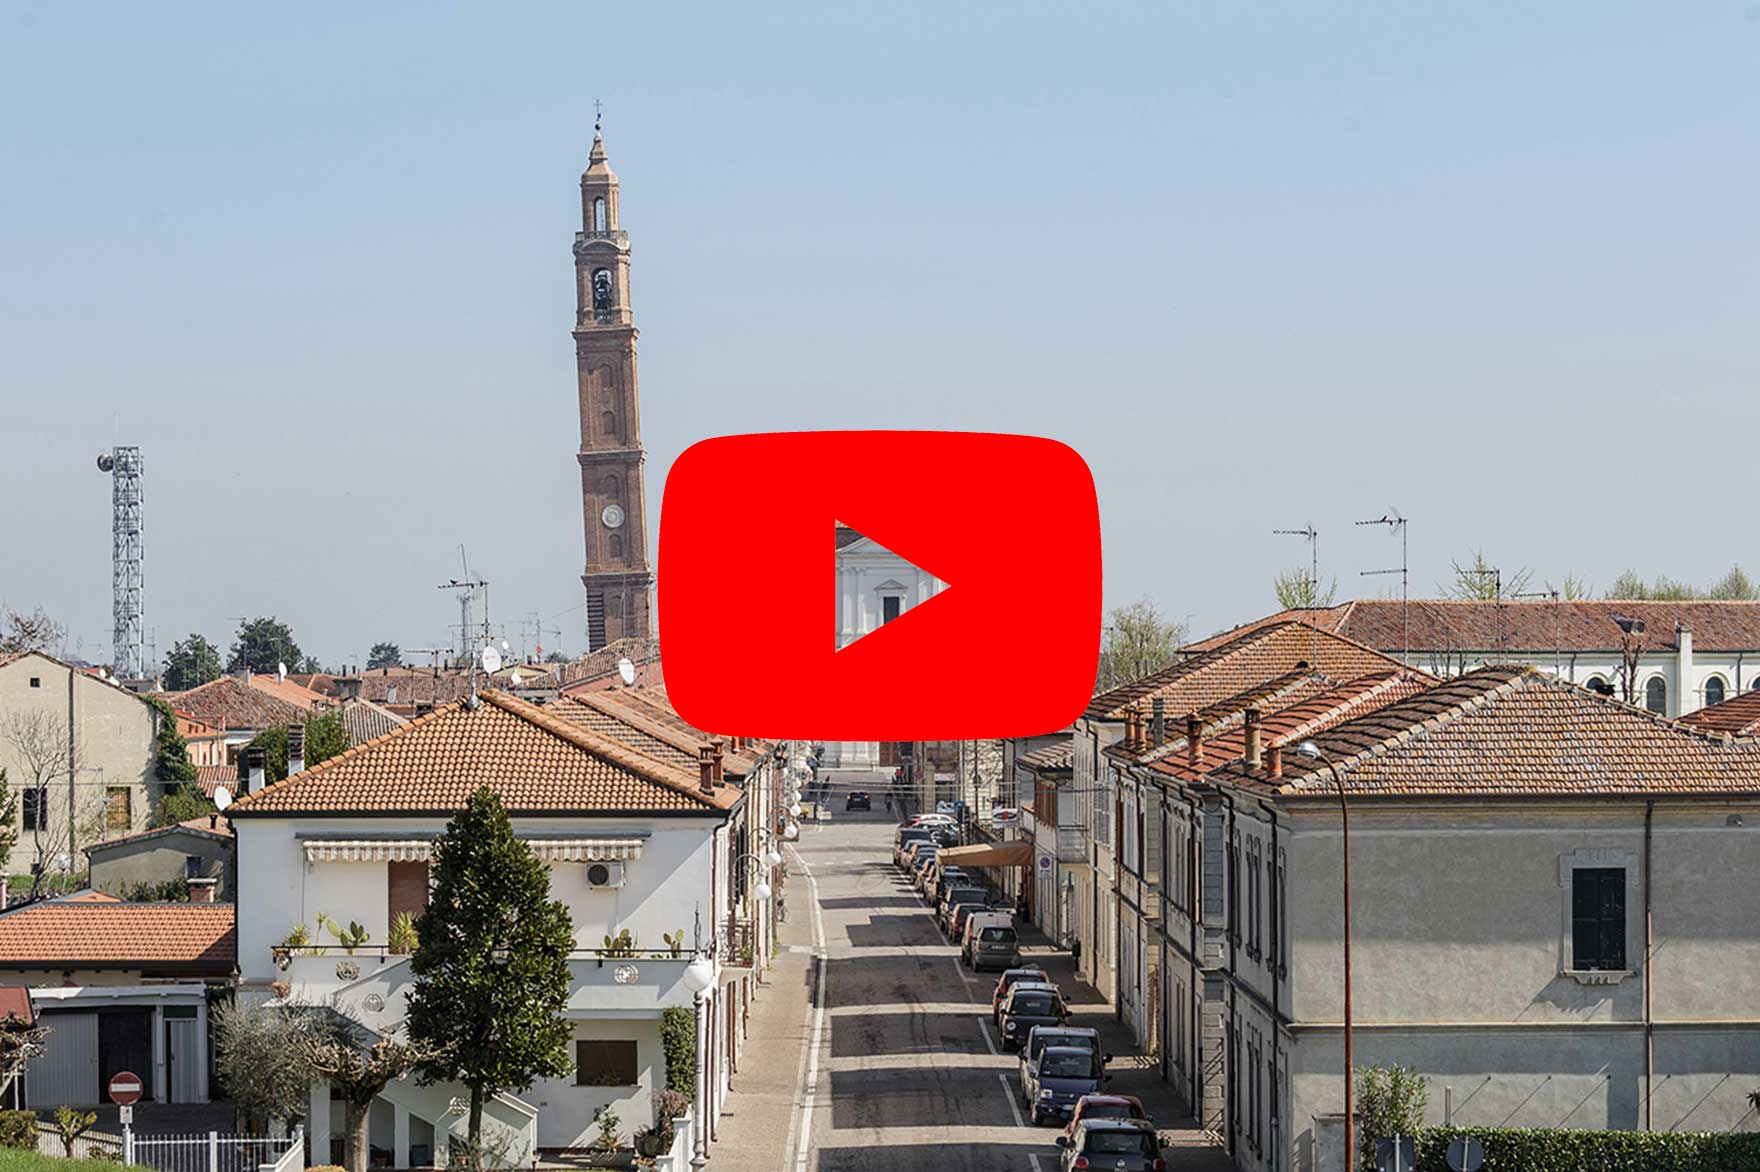 Pro Loco Ficarolo arriva su YouTube